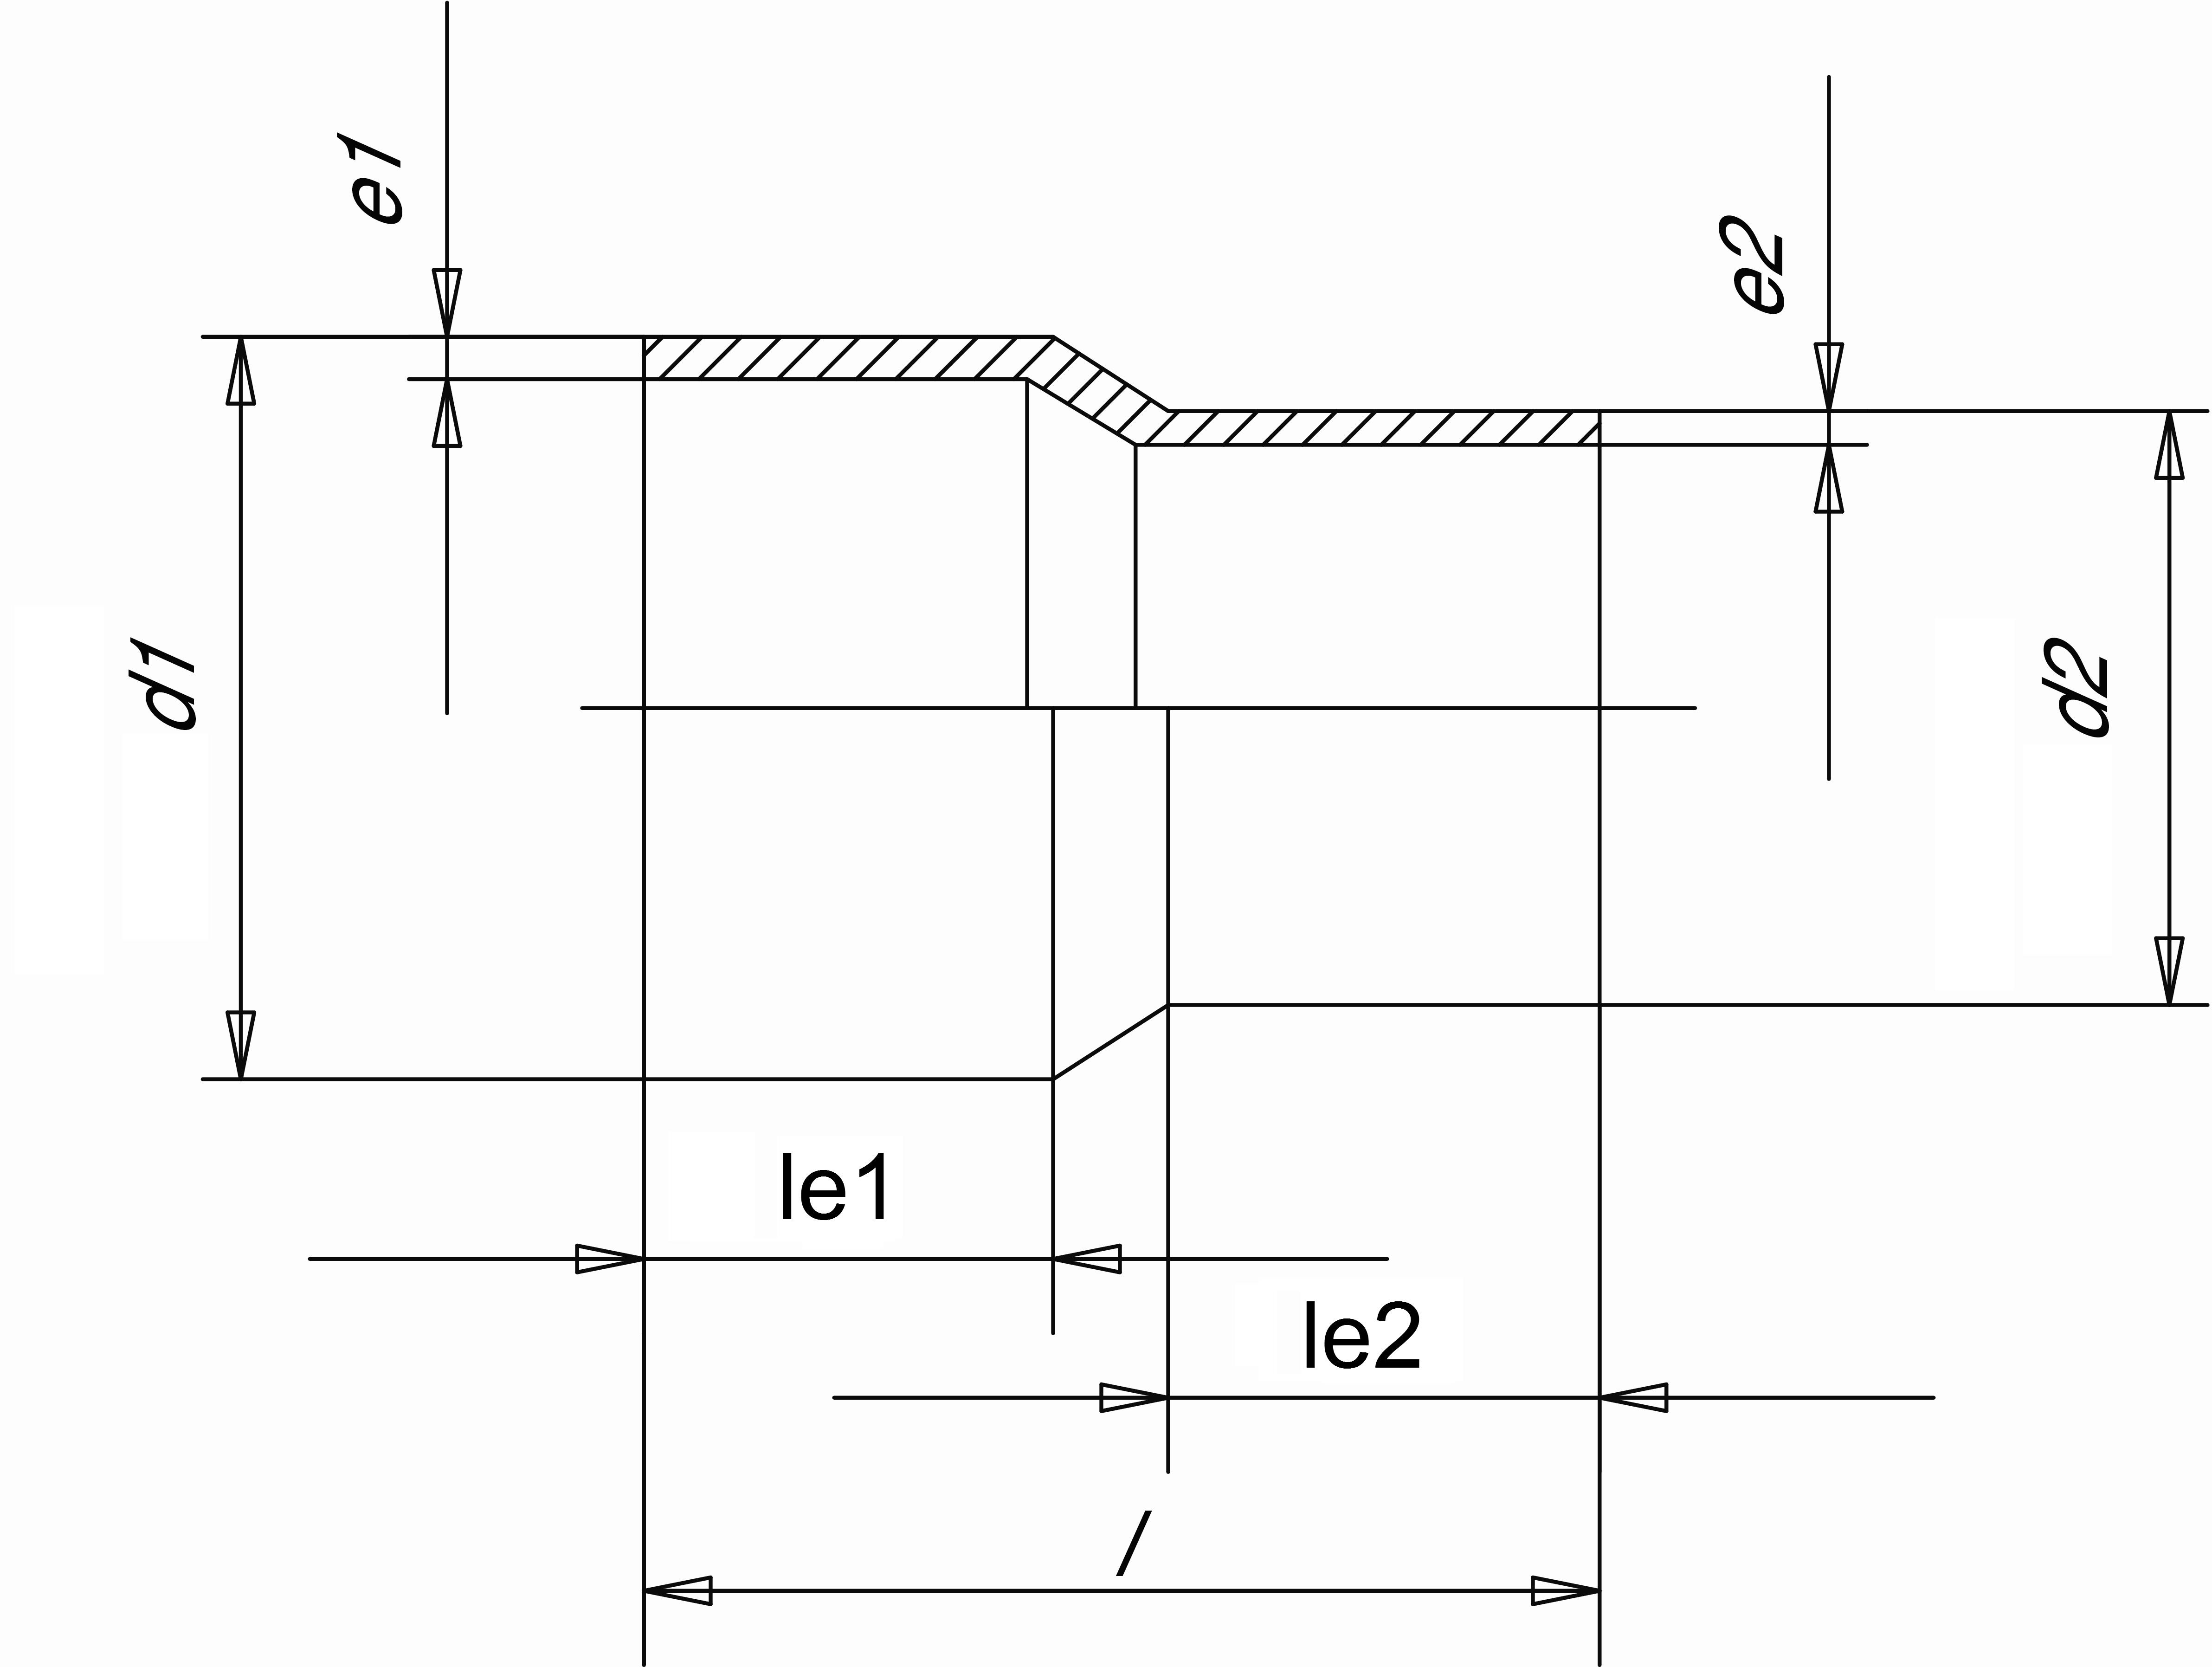 Муфта редукционная (Simona) SDR21 PN16 63x50